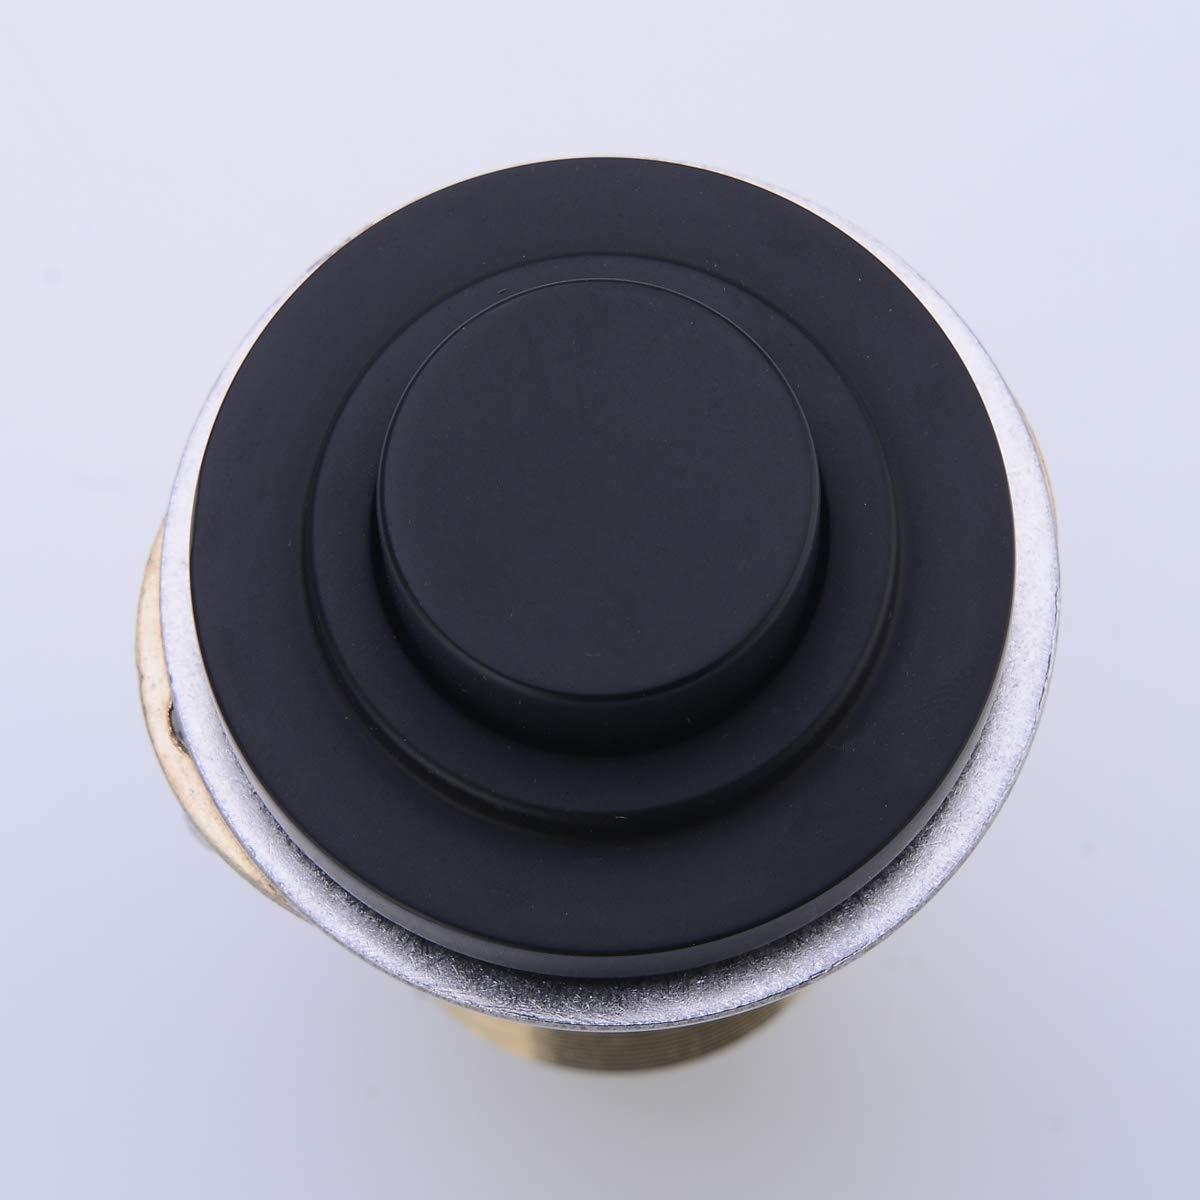 SINKINGDOM SinkTop Air Switch Kit (Full Brass) for Garbage Disposal, Cordless (Matte Black) by SINKINGDOM (Image #2)